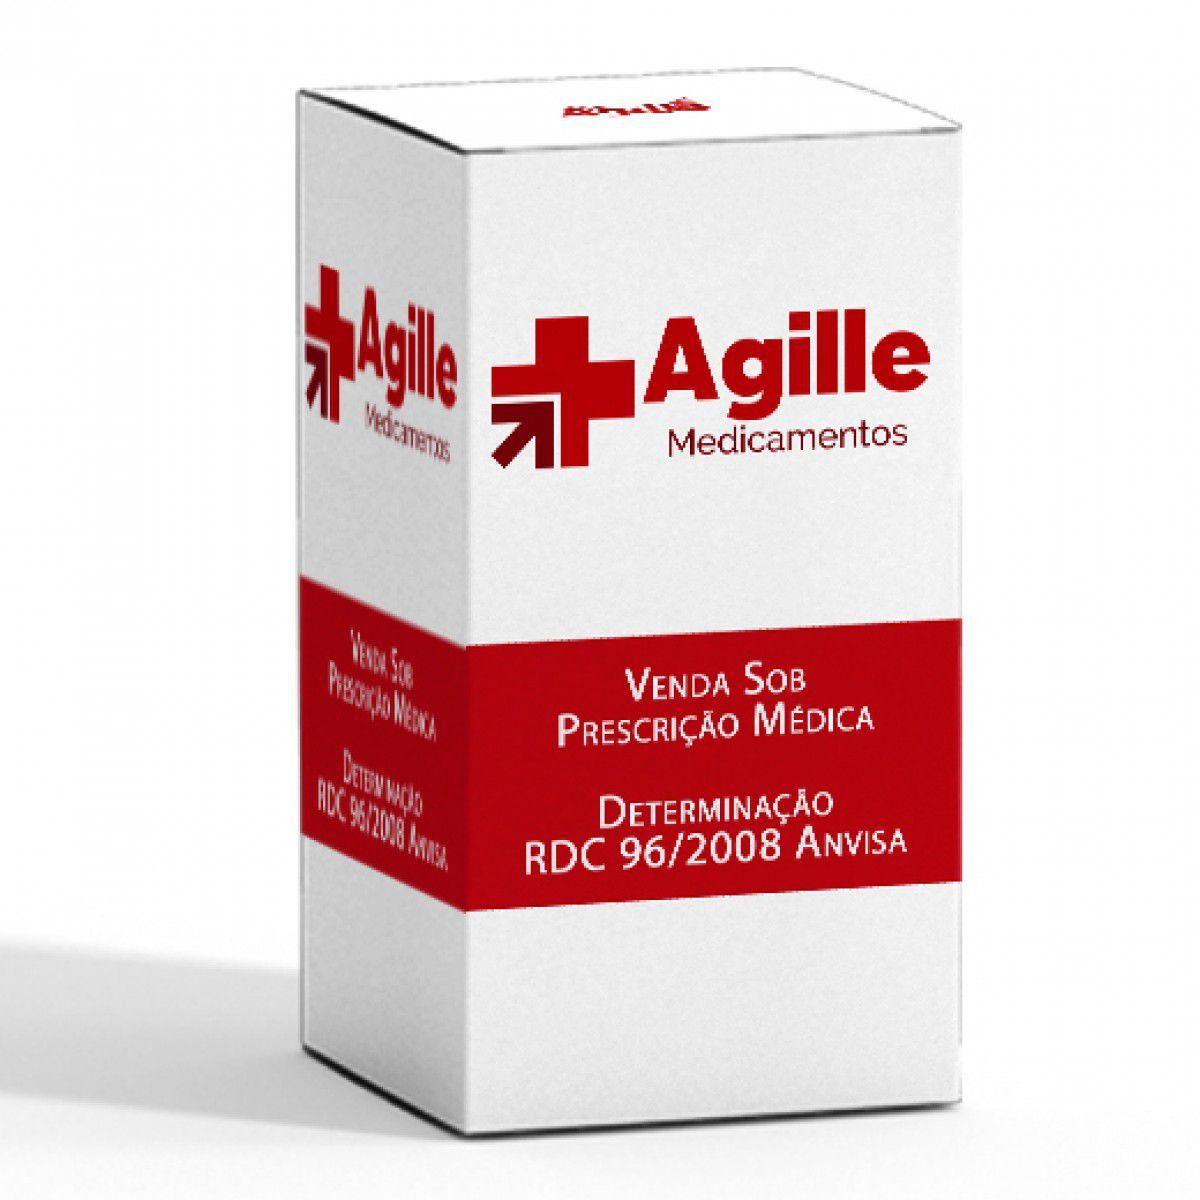 ADRIBLASTINA RD 10MG (C/1 FRA)  - Agille Speciality